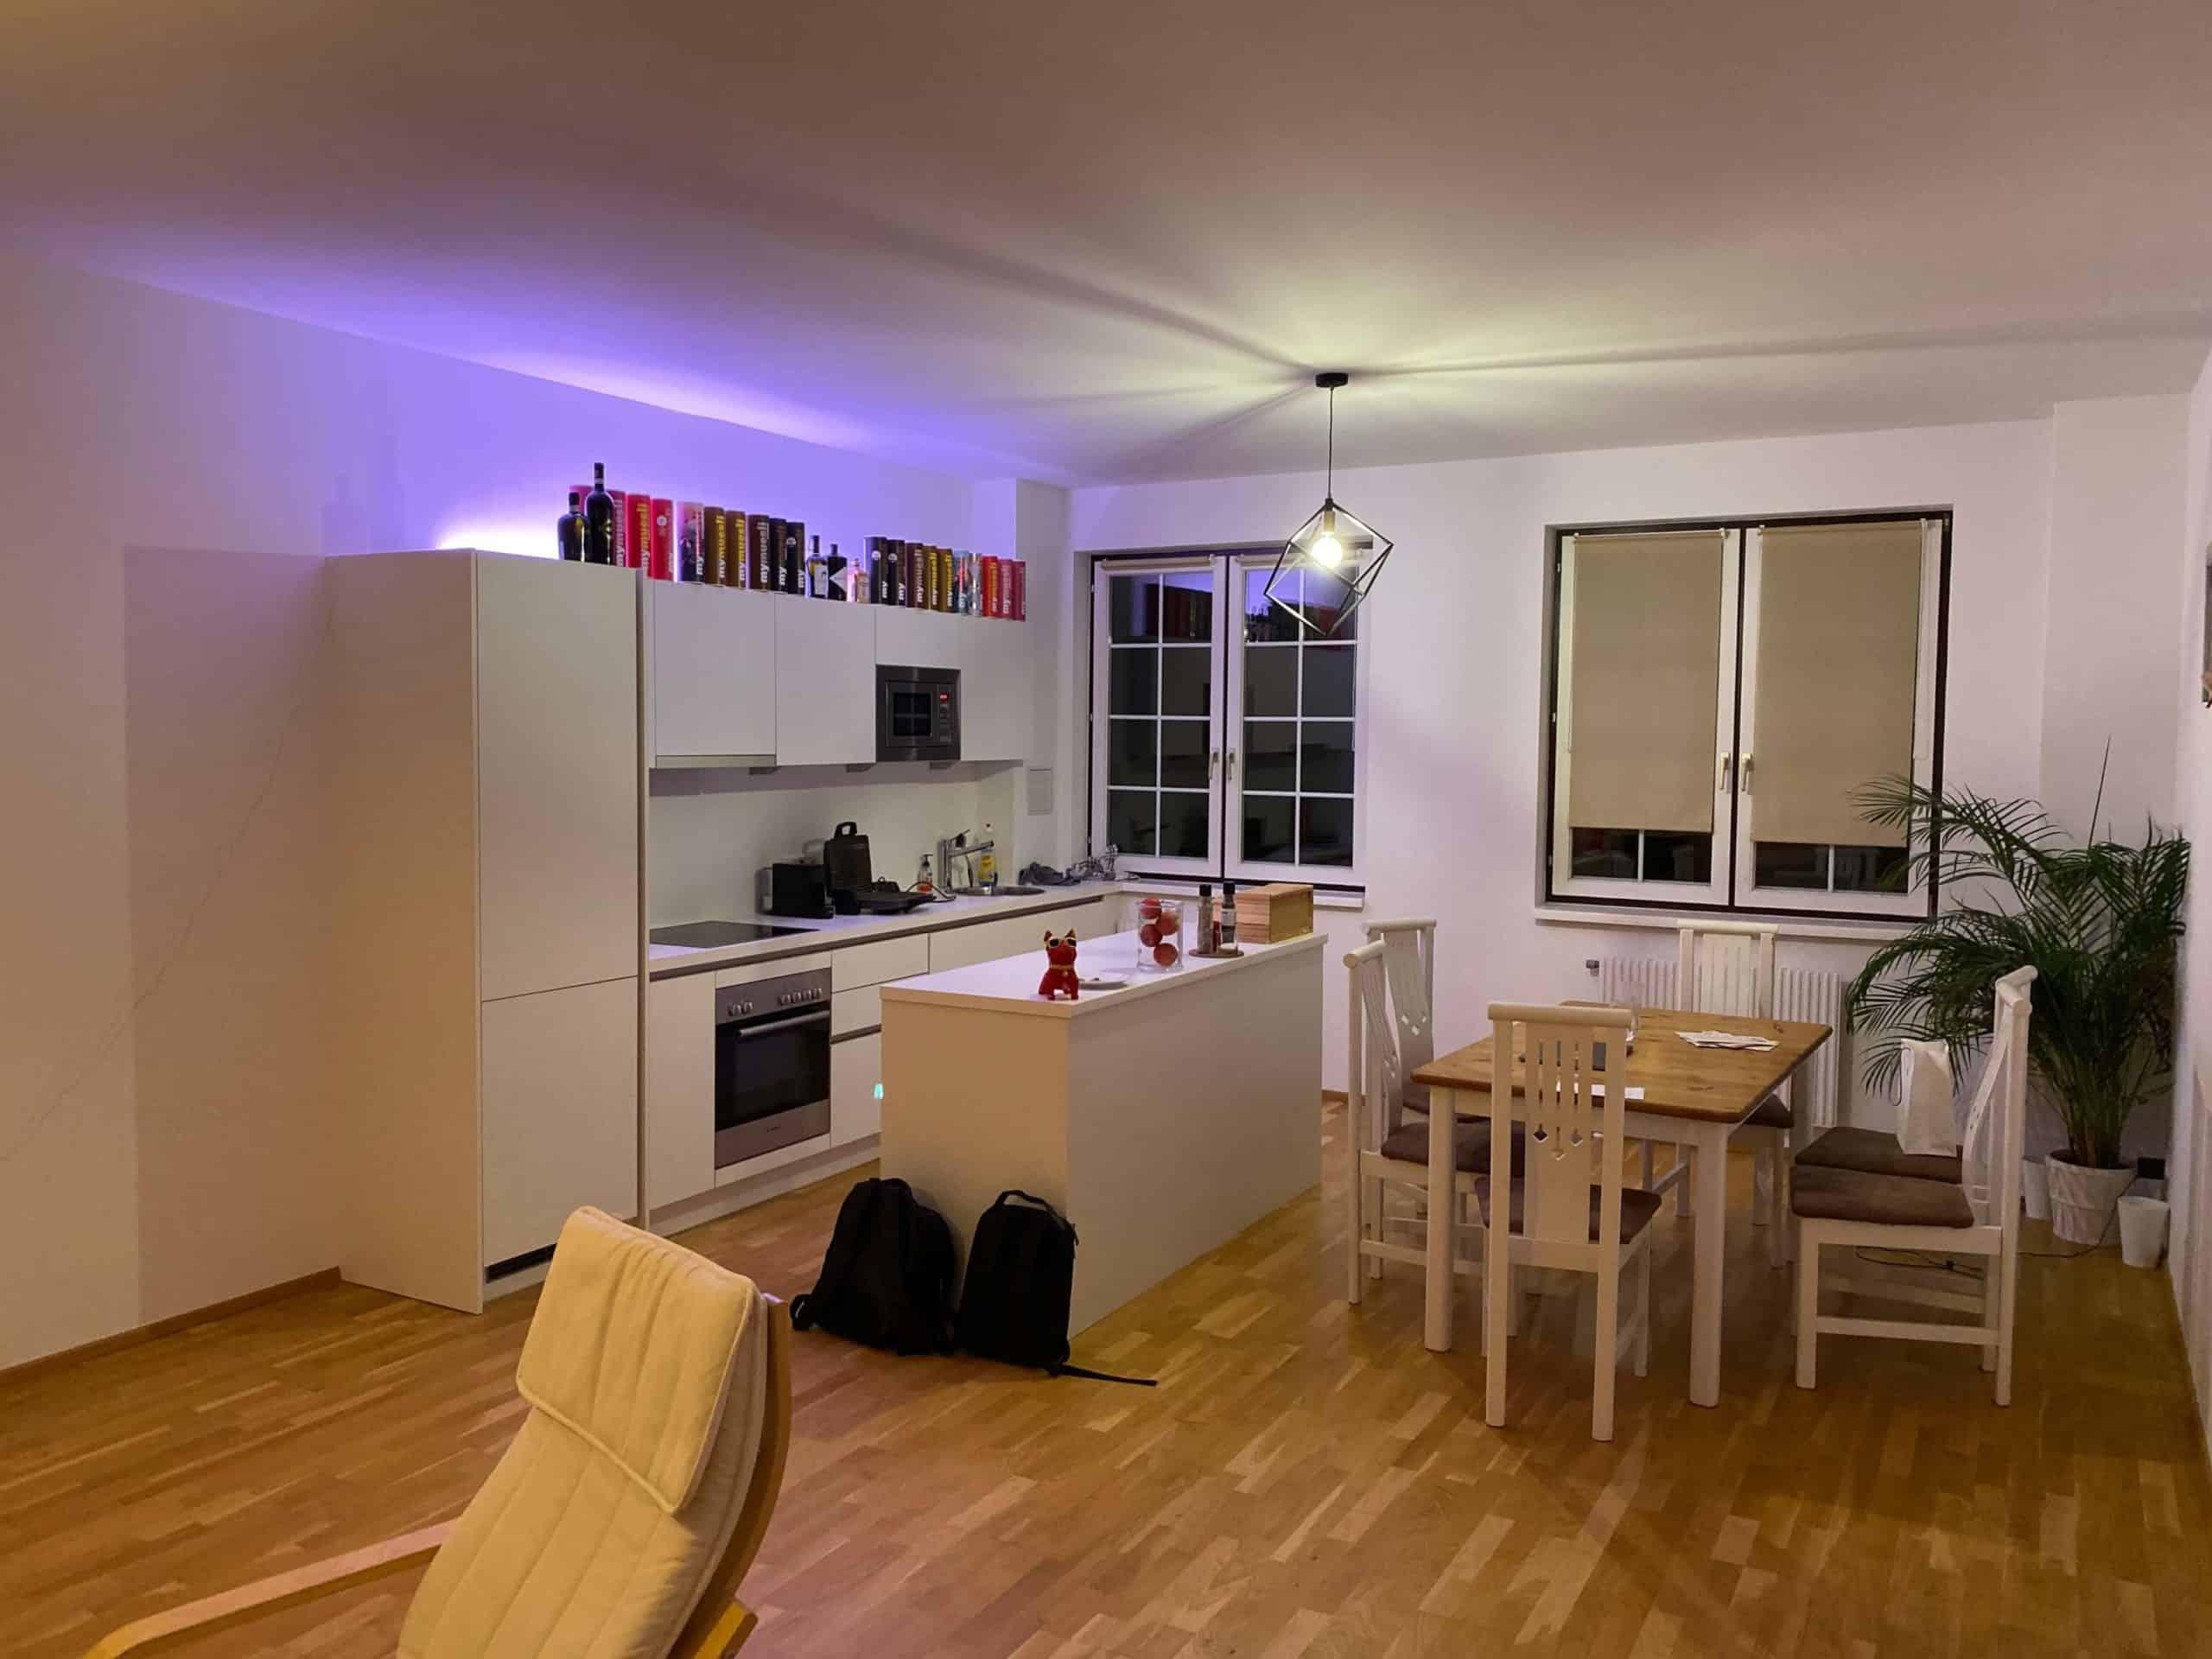 xxl kamera vergleich iphone x versus iphone 11 pro bei. Black Bedroom Furniture Sets. Home Design Ideas